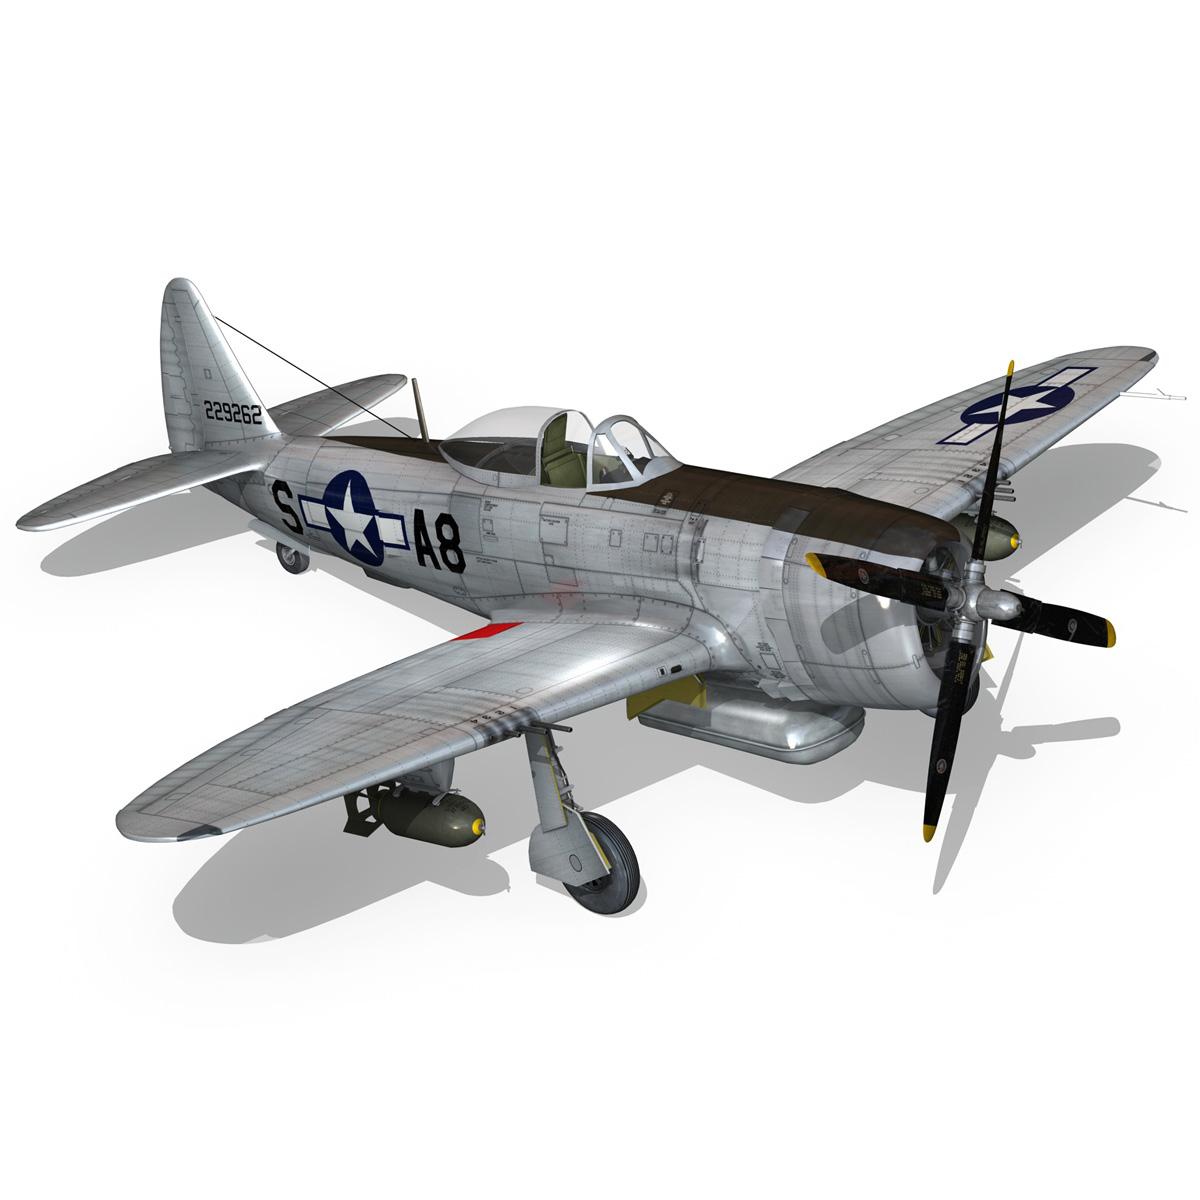 republic p-47 thunderbolt – daddy rabbit 3d model fbx c4d lwo obj 272701